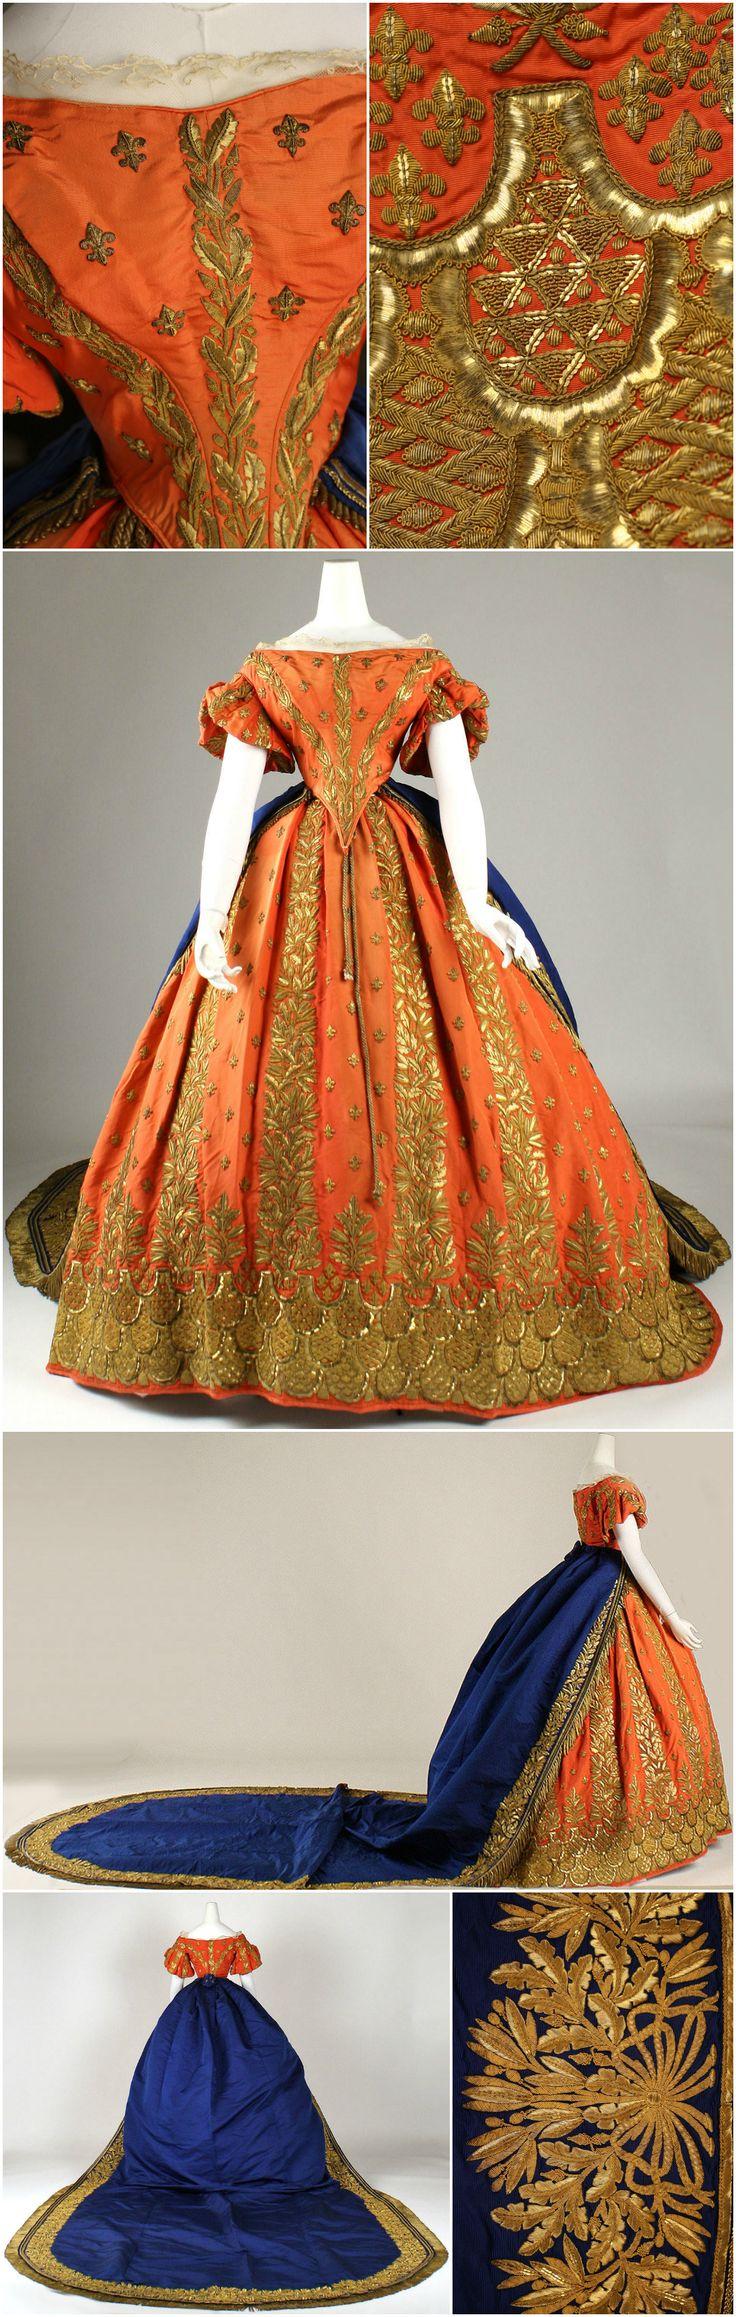 Court ensemble, Italian, 1857-60, at the Metropolitan Museum of Art. Silk, gold. CLICK THROUGH FOR BIGGER IMAGES.